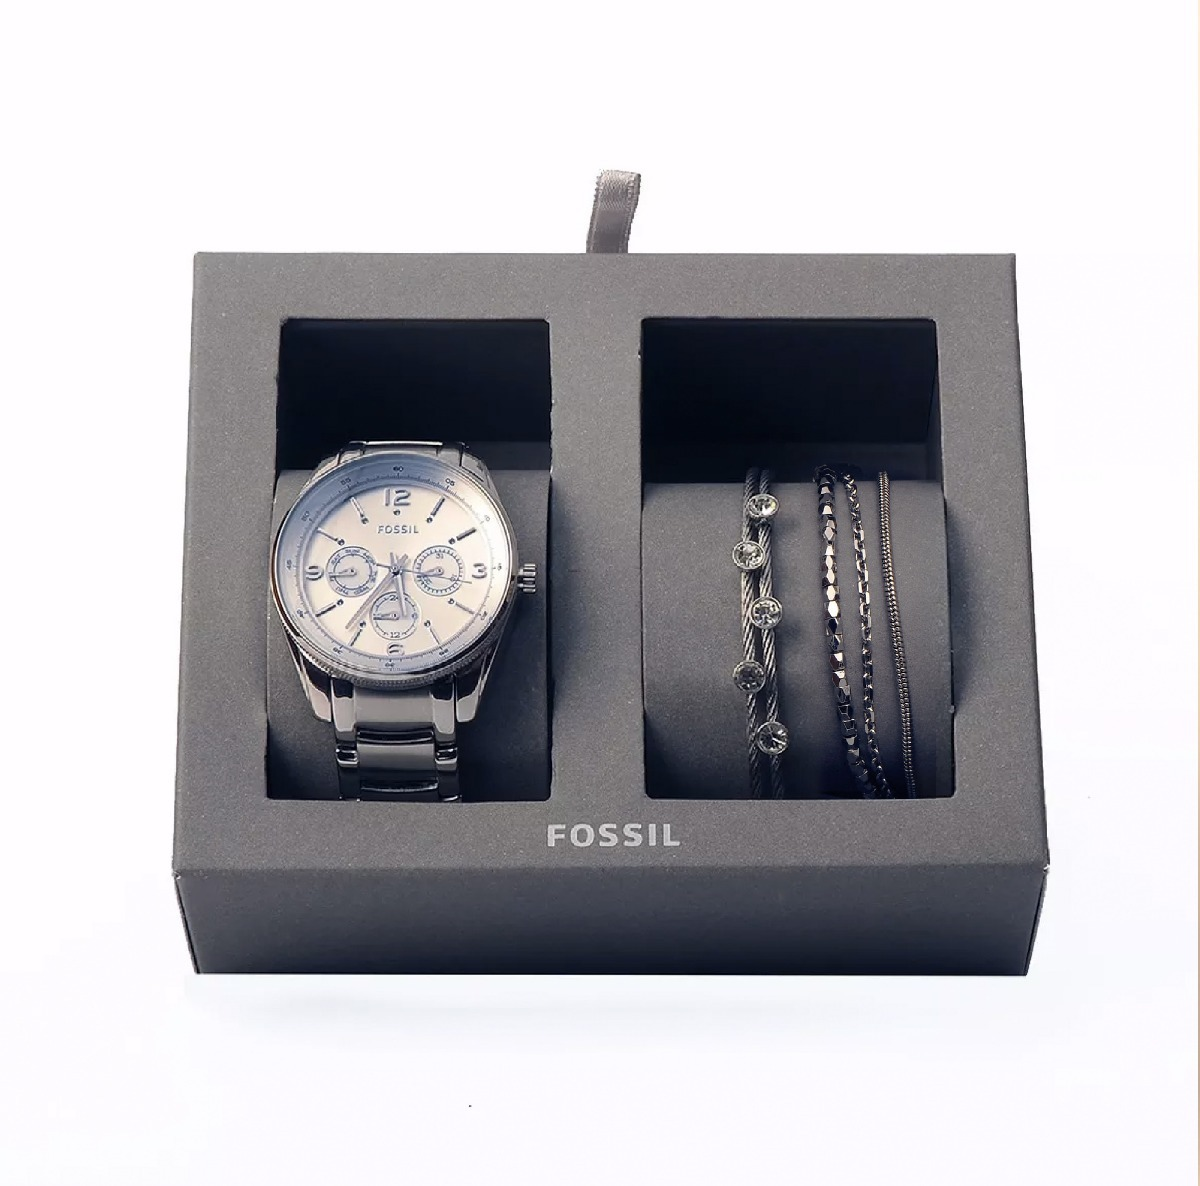 ed74c7c1e208 reloj fossil mujer + 2 pulseras set original envío gratis. Cargando zoom.